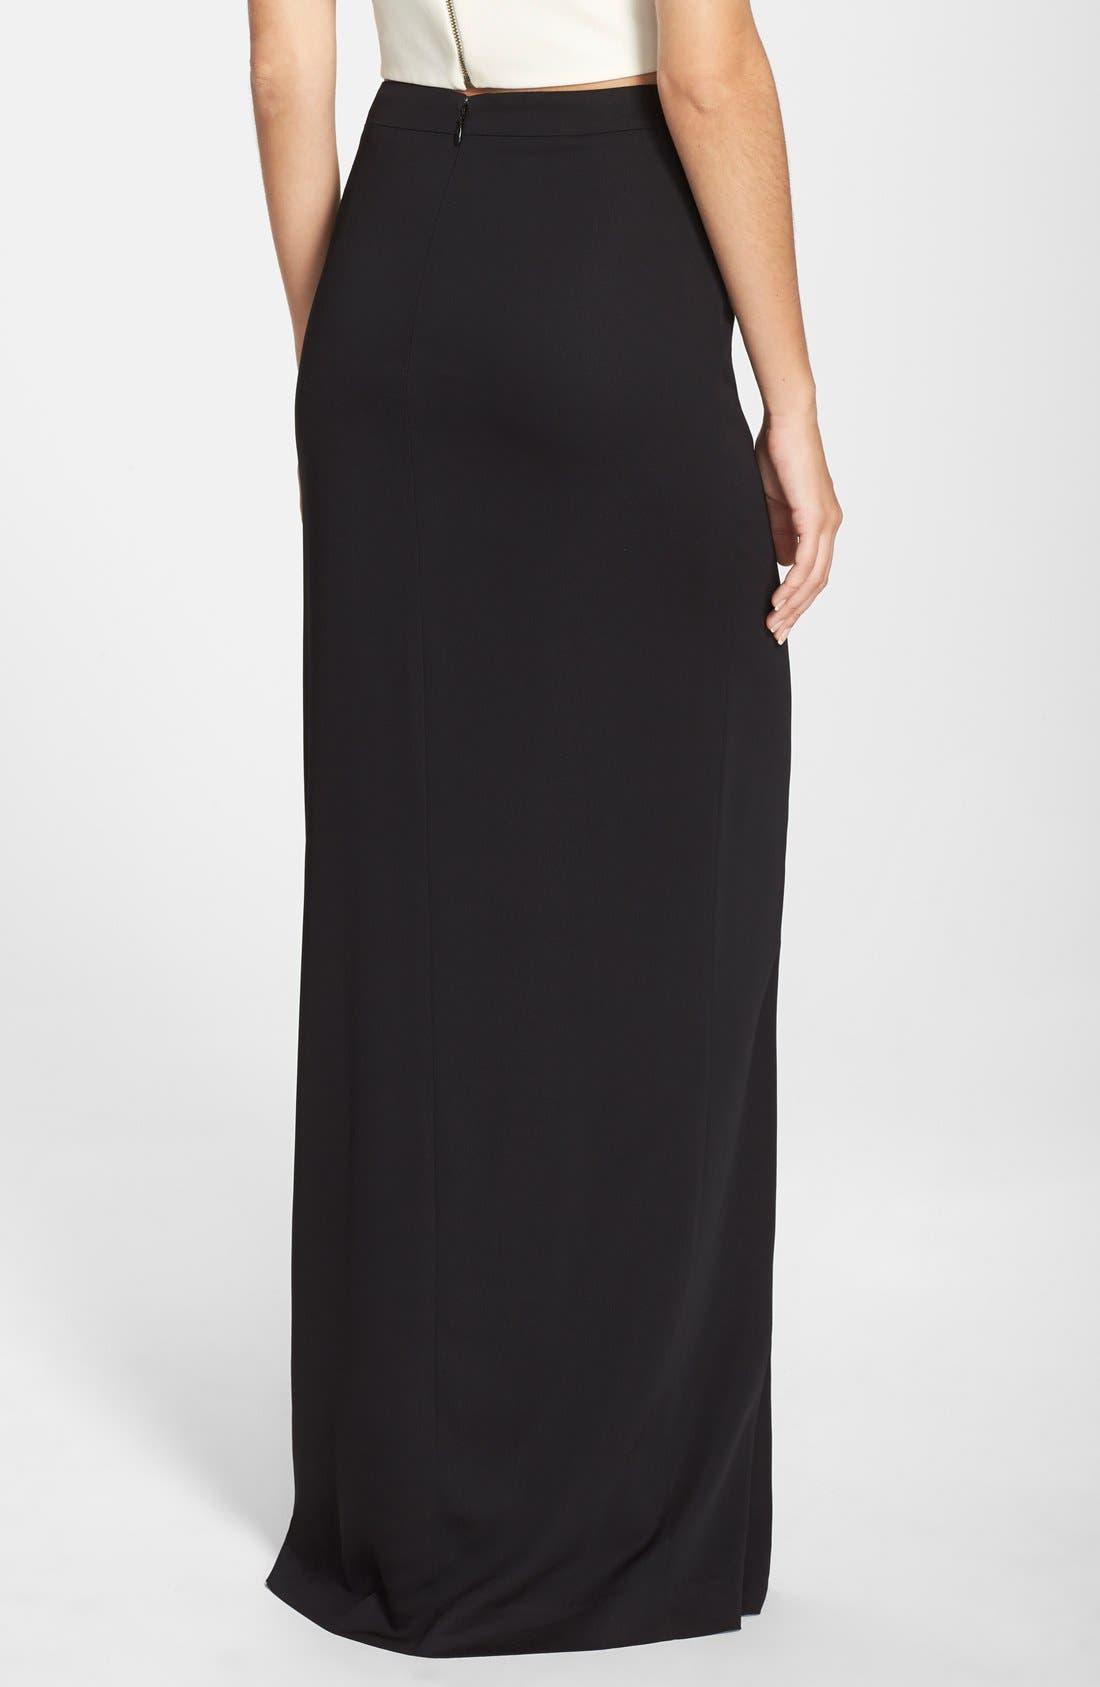 Alternate Image 2  - Nicole Miller Front Slit Stretch Crepe Maxi Skirt